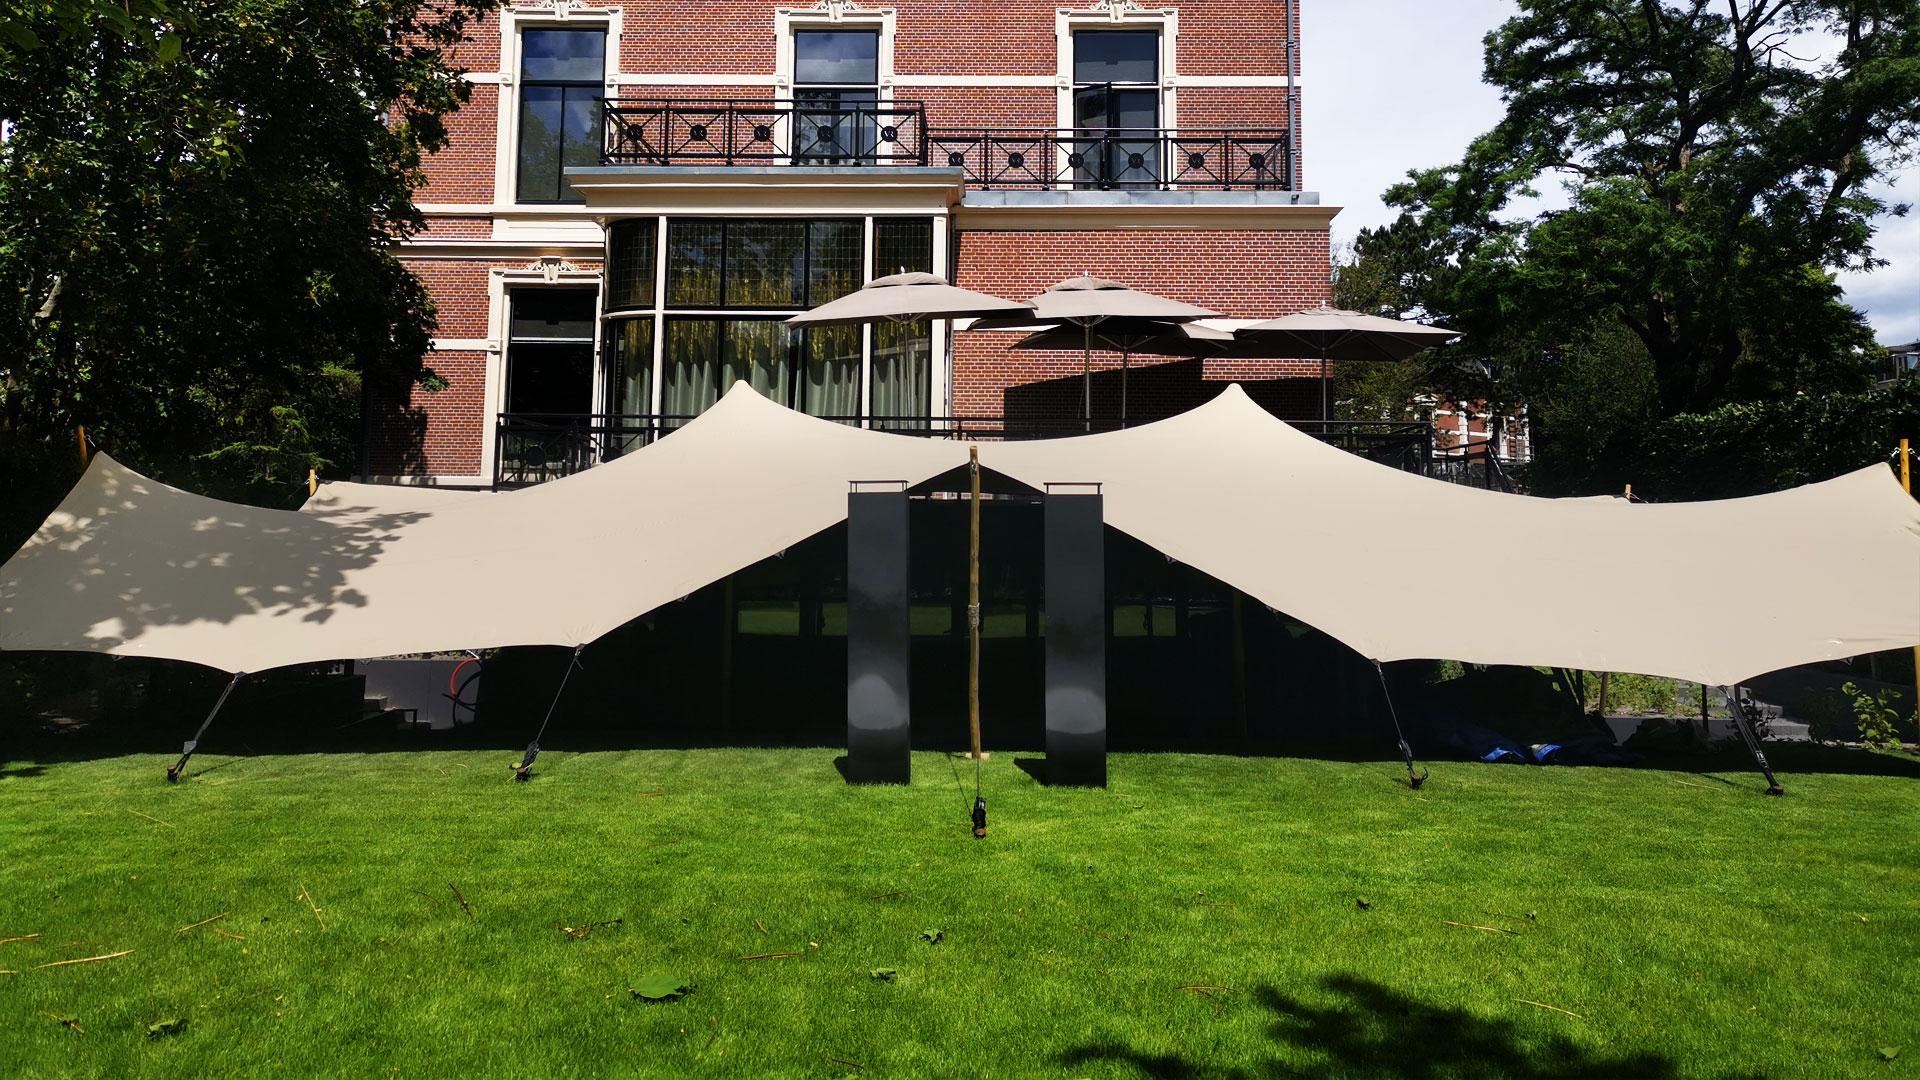 alphatentevent-bruiloftenthuren-partytent-flextent-stretchtent-7,5x15-meter-feesttent-privéfeest-festivaltent-web